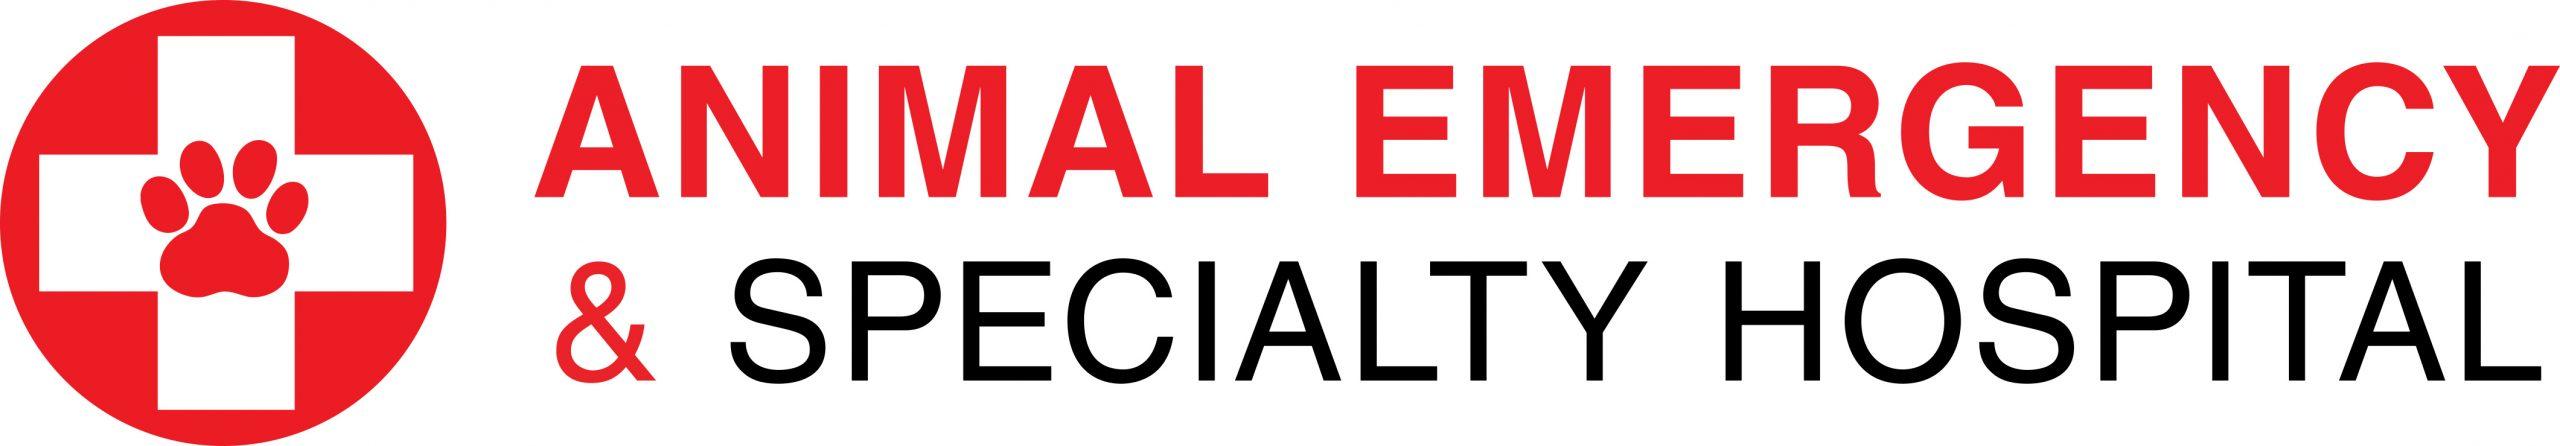 Ottawa Animal Emergency and Specialty Hospital